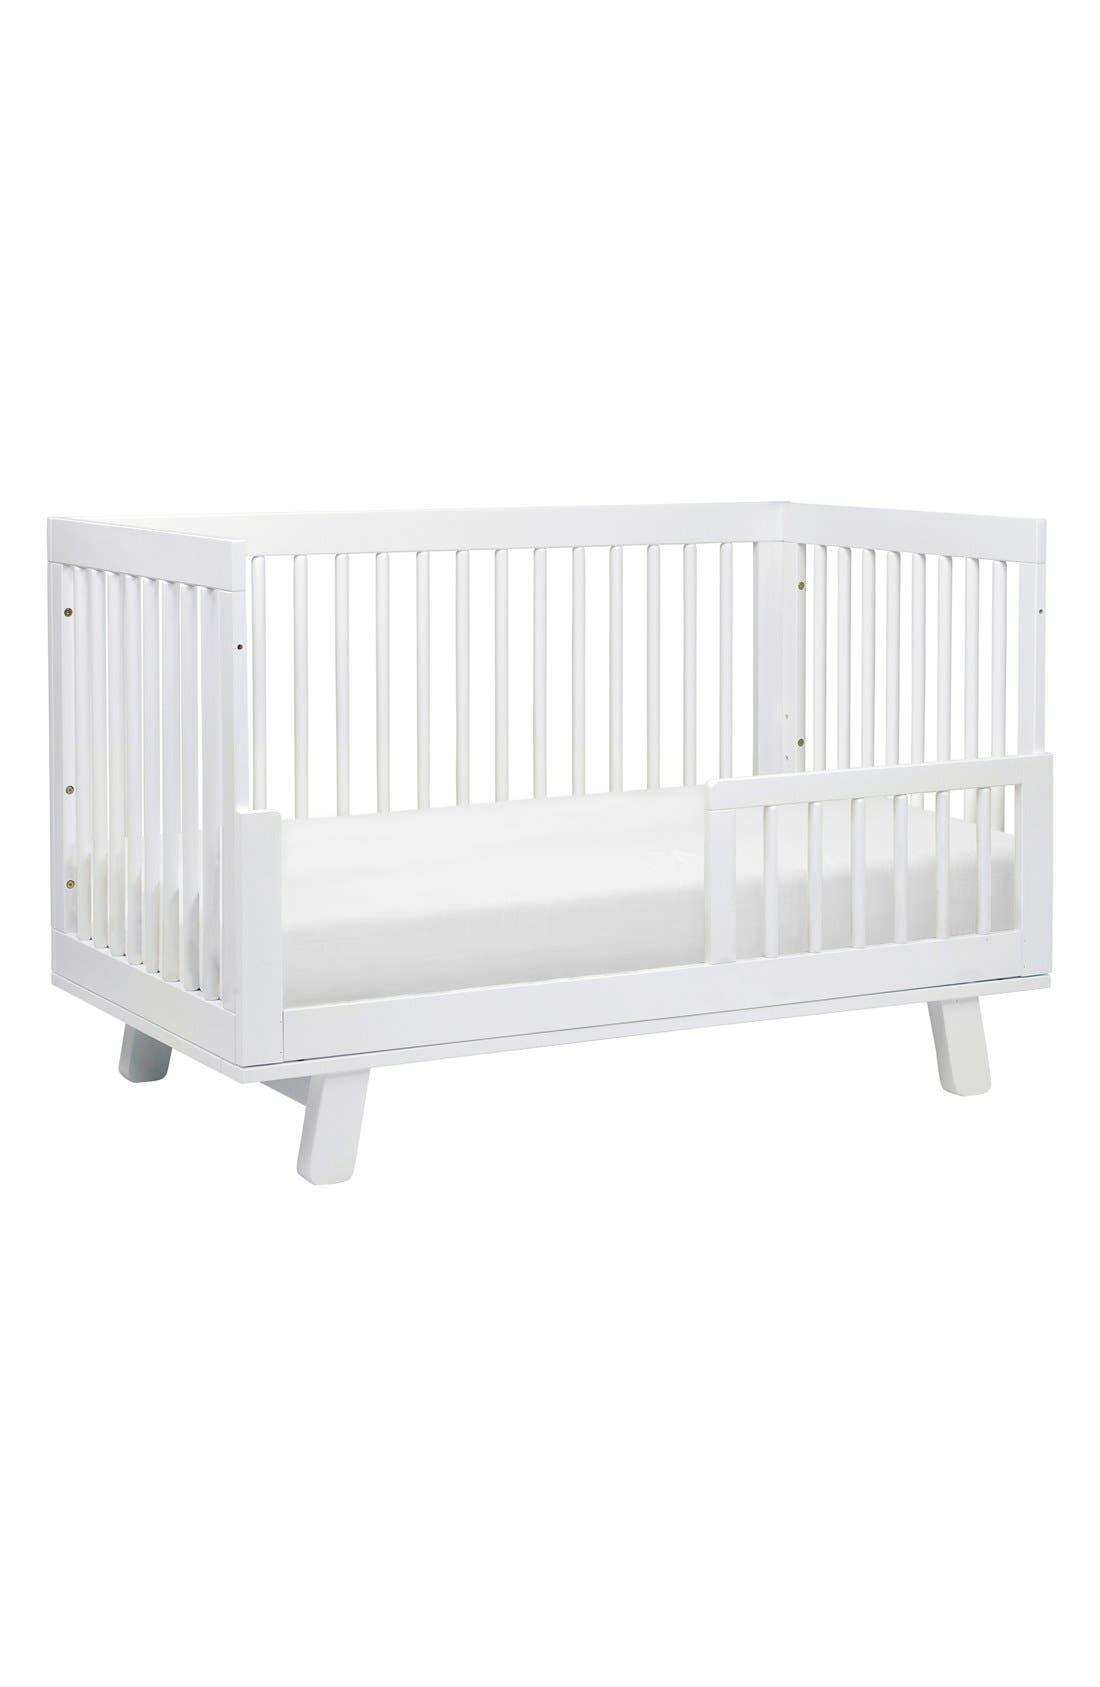 'Hudson' 3-in-1 Convertible Crib,                             Alternate thumbnail 24, color,